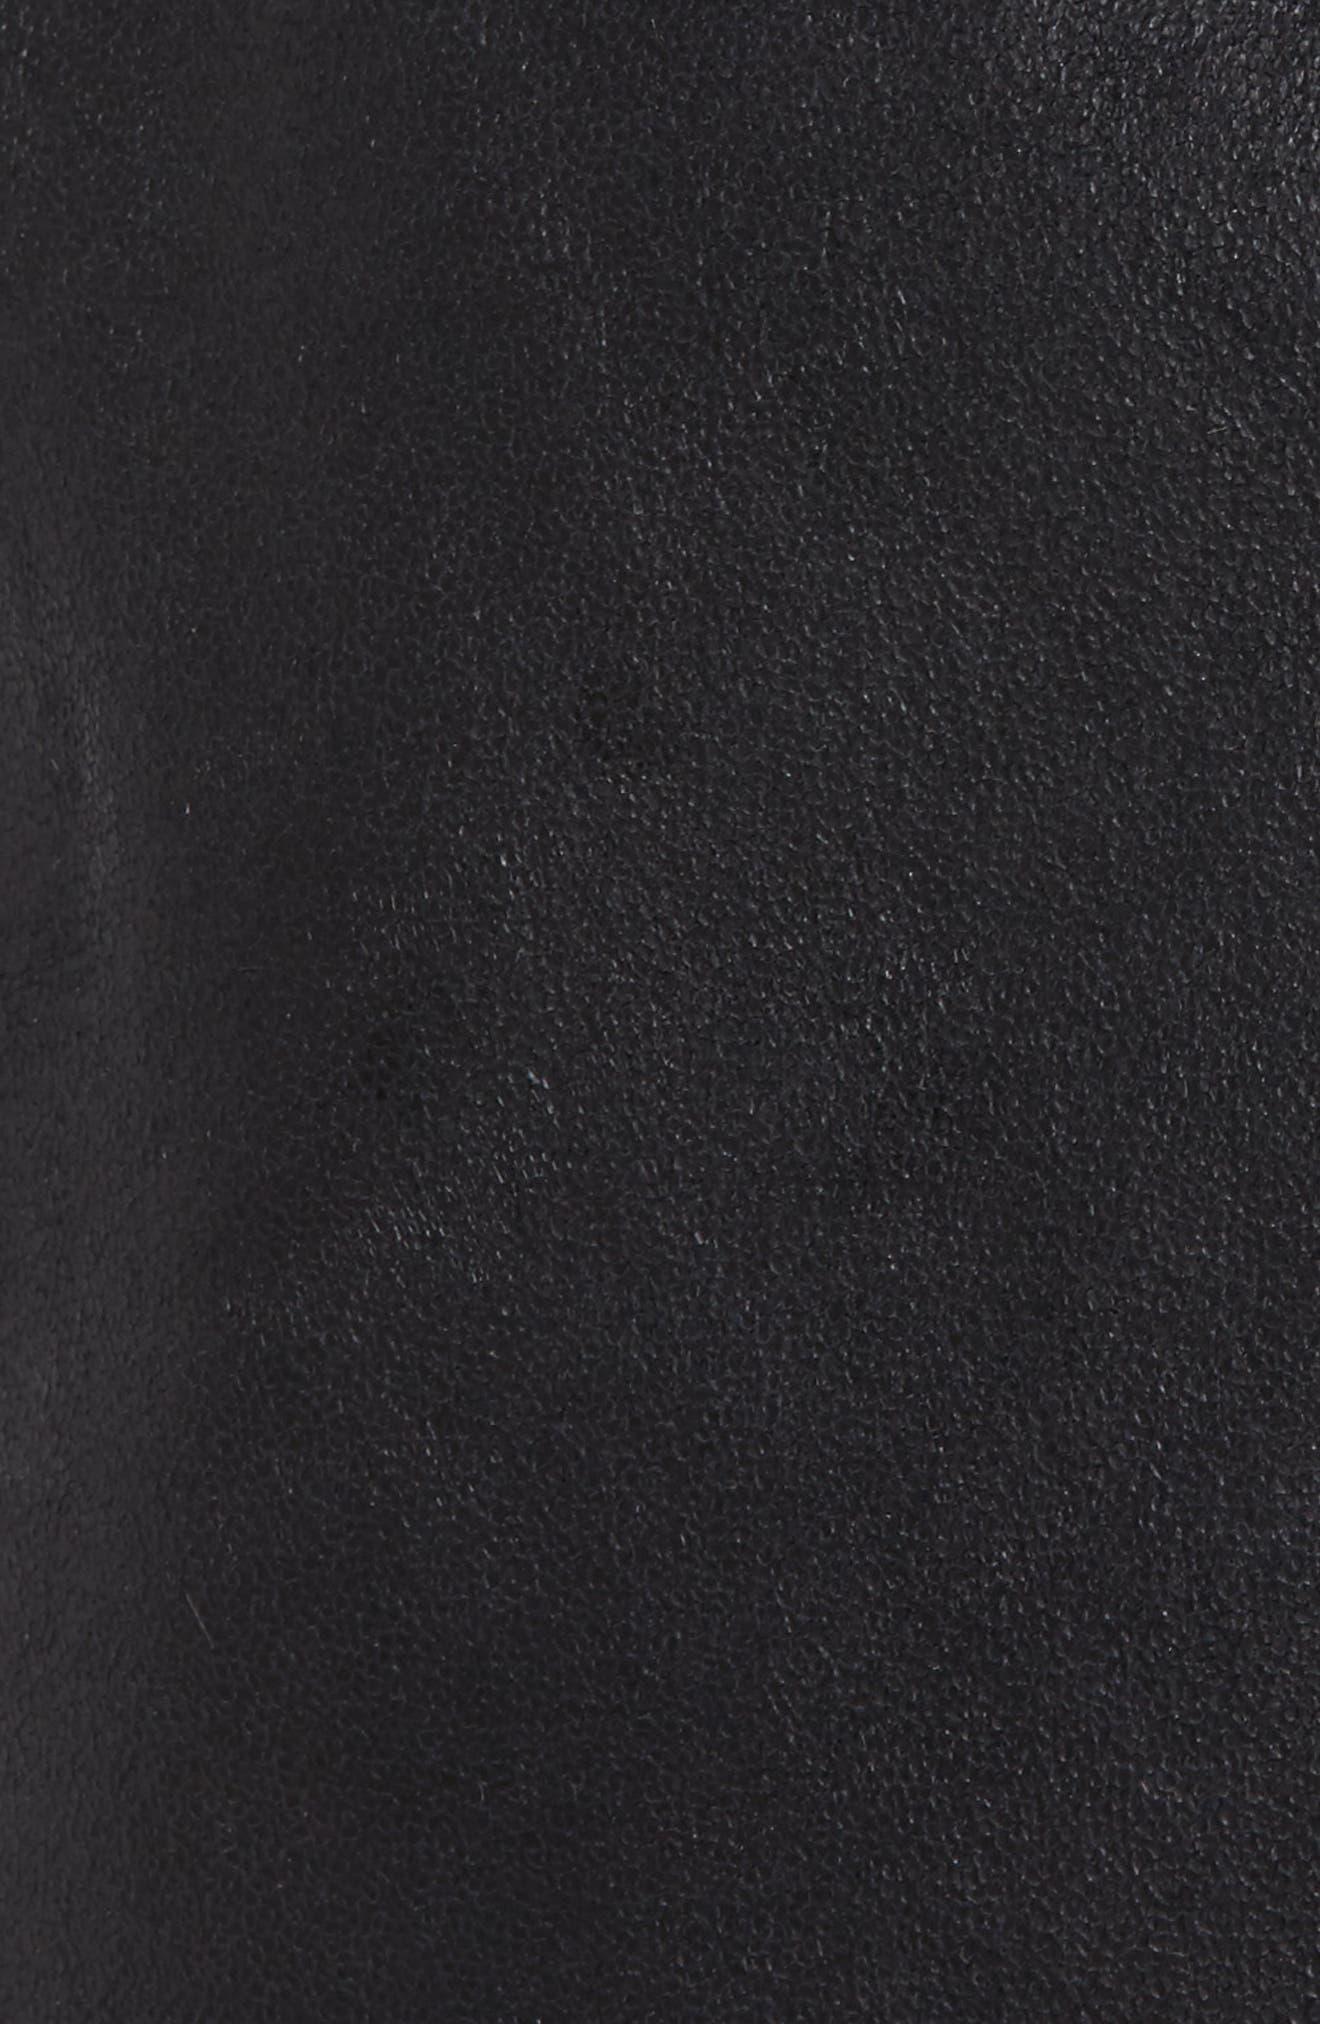 Bosworth Faux Shearling Jacket,                             Alternate thumbnail 6, color,                             001